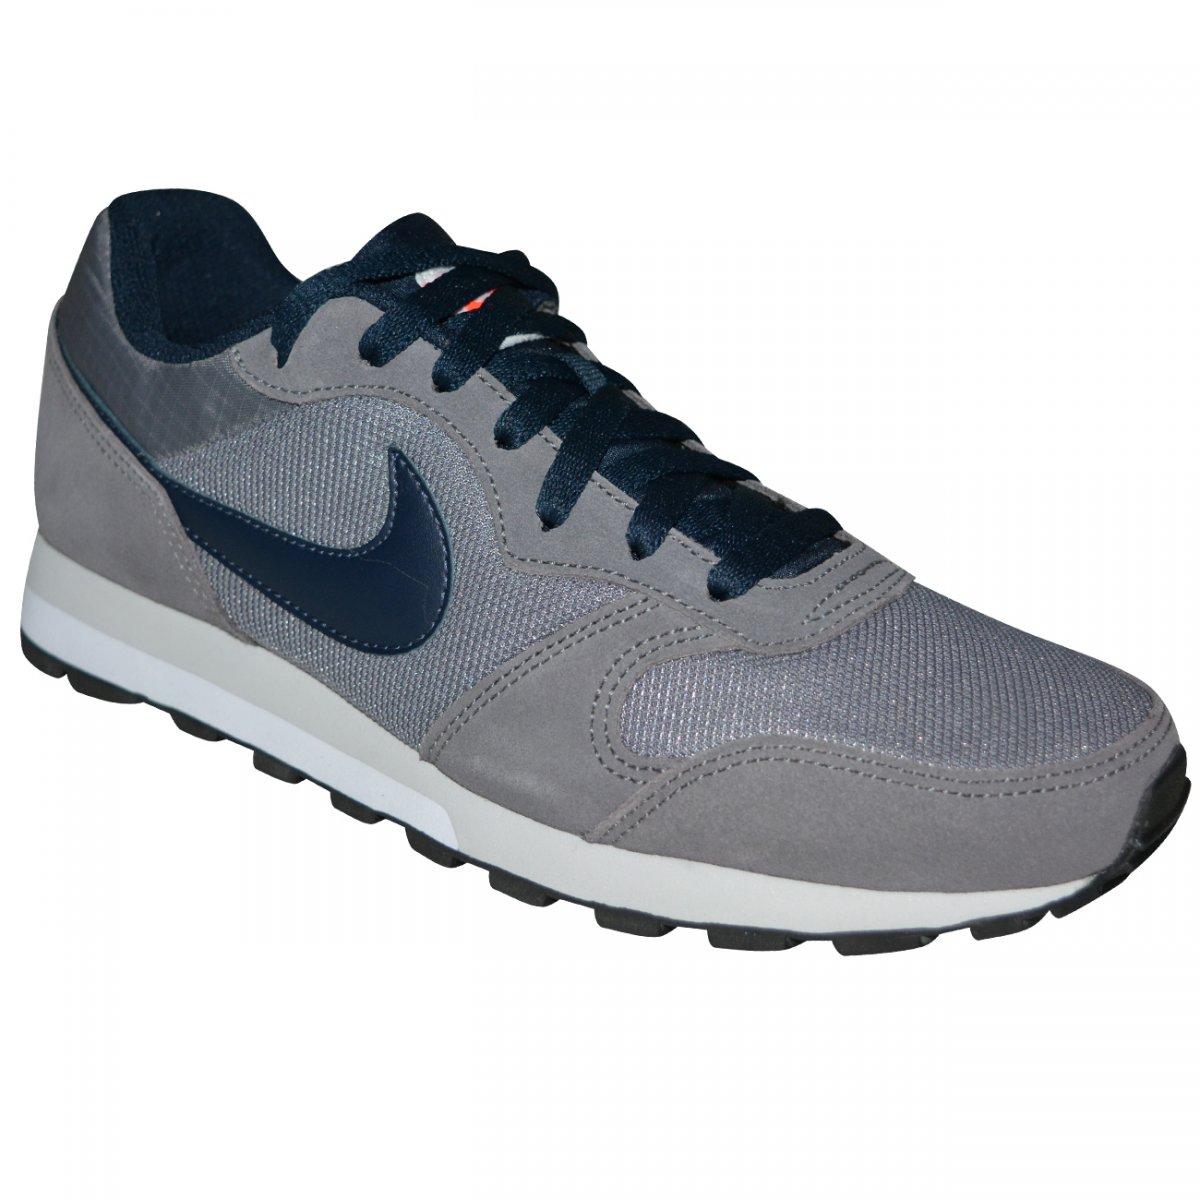 41a890973 Tenis Nike MD Runner 2 749794 007 - Grafite marinho - Chuteira Nike ...